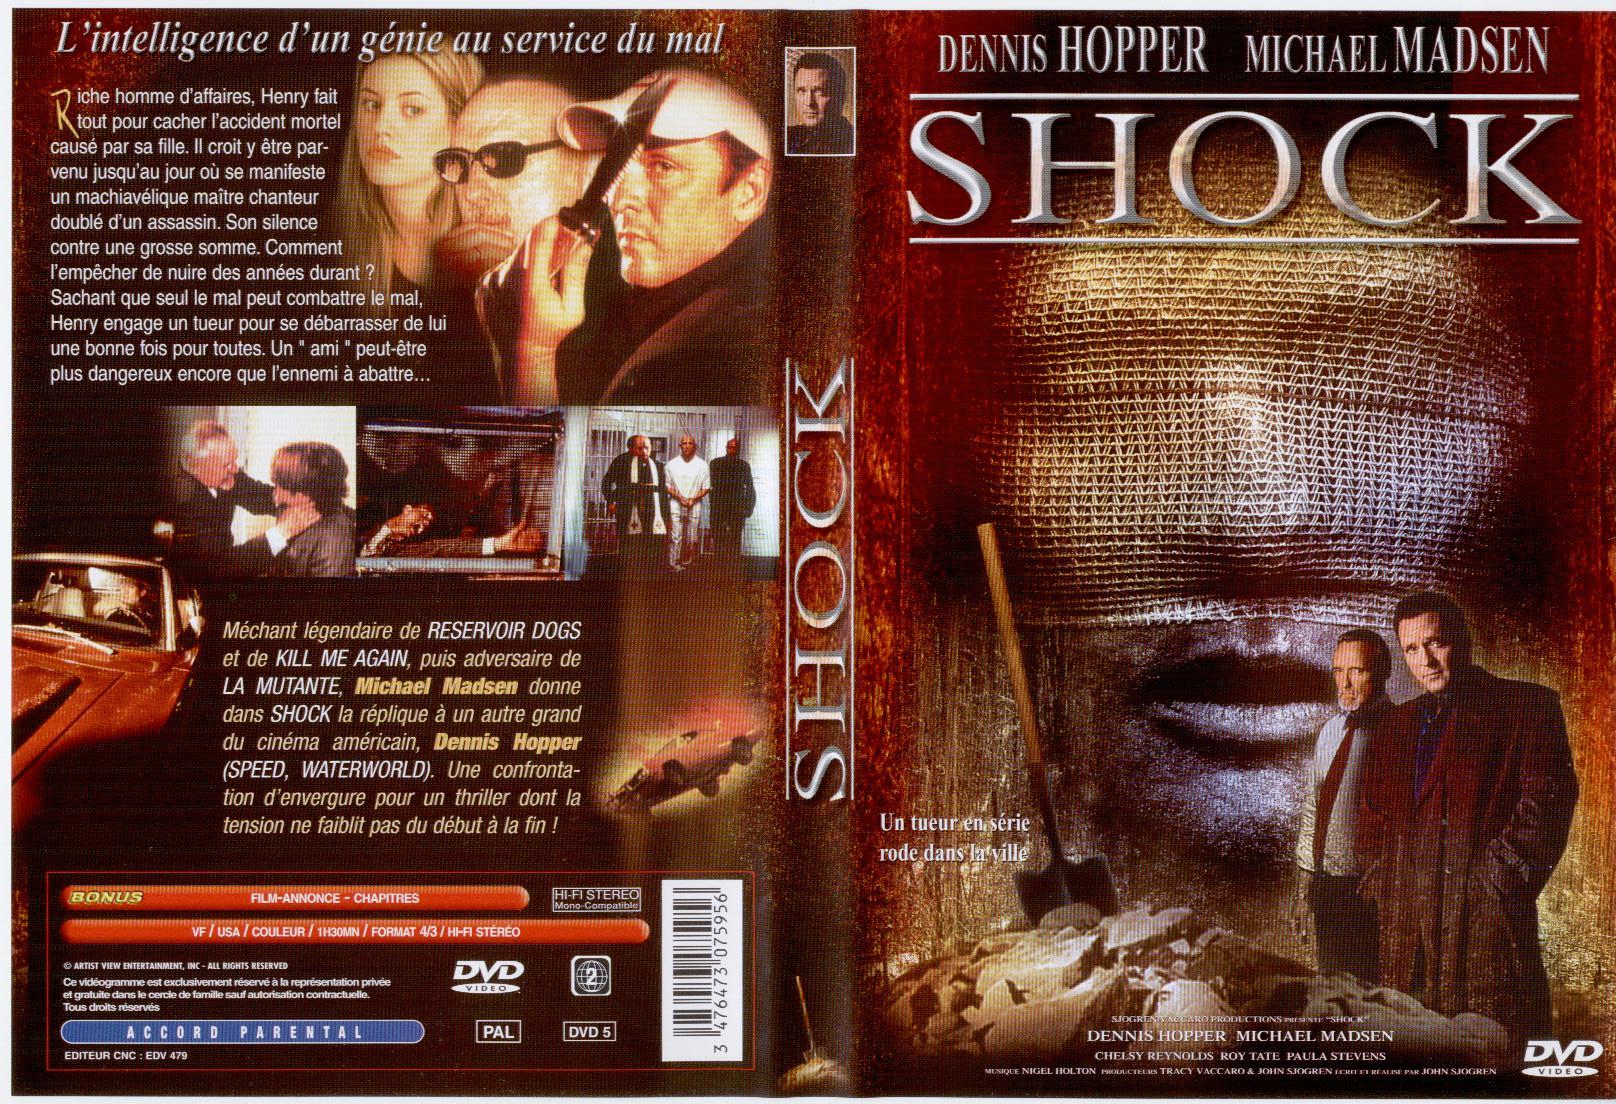 Jaquette DVD Shock